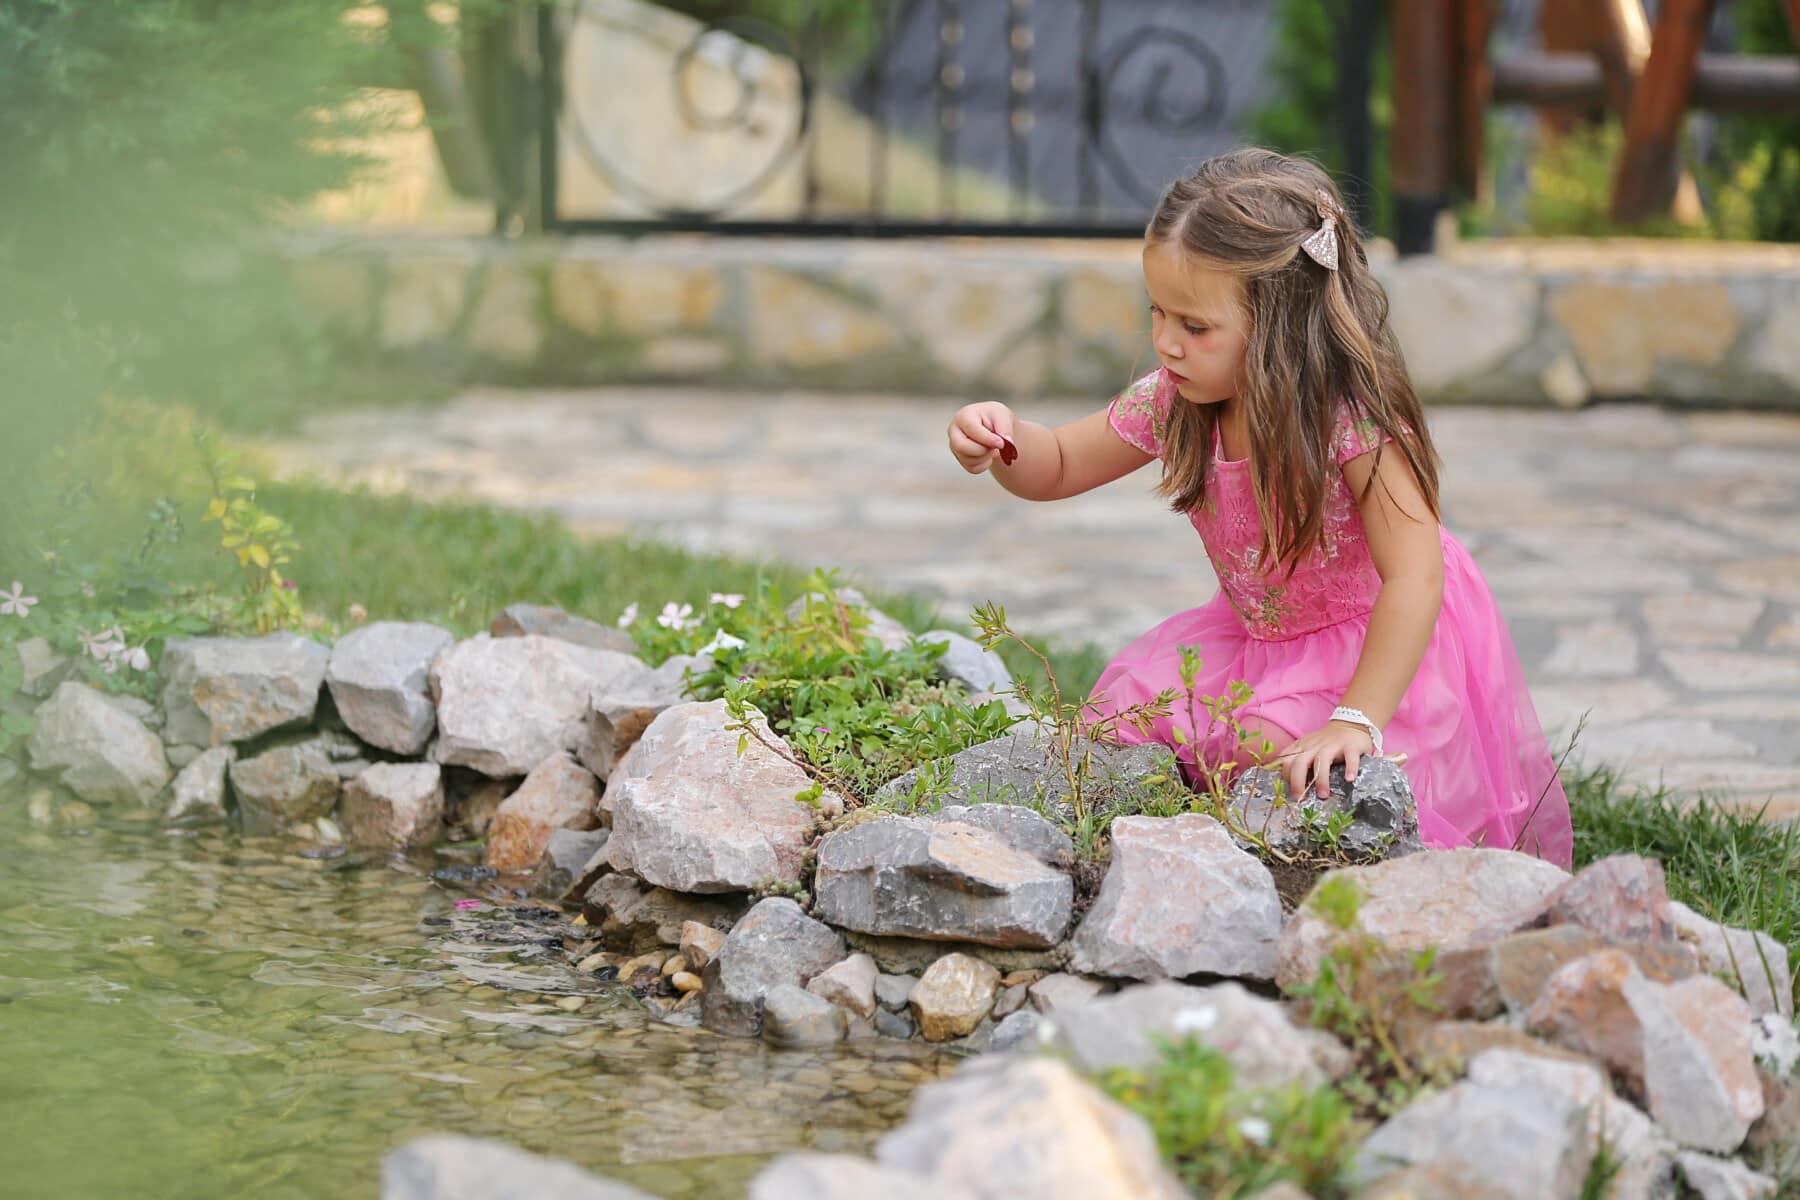 blonde, child, sitting, pond, backyard, playful, garden, nature, girl, summer